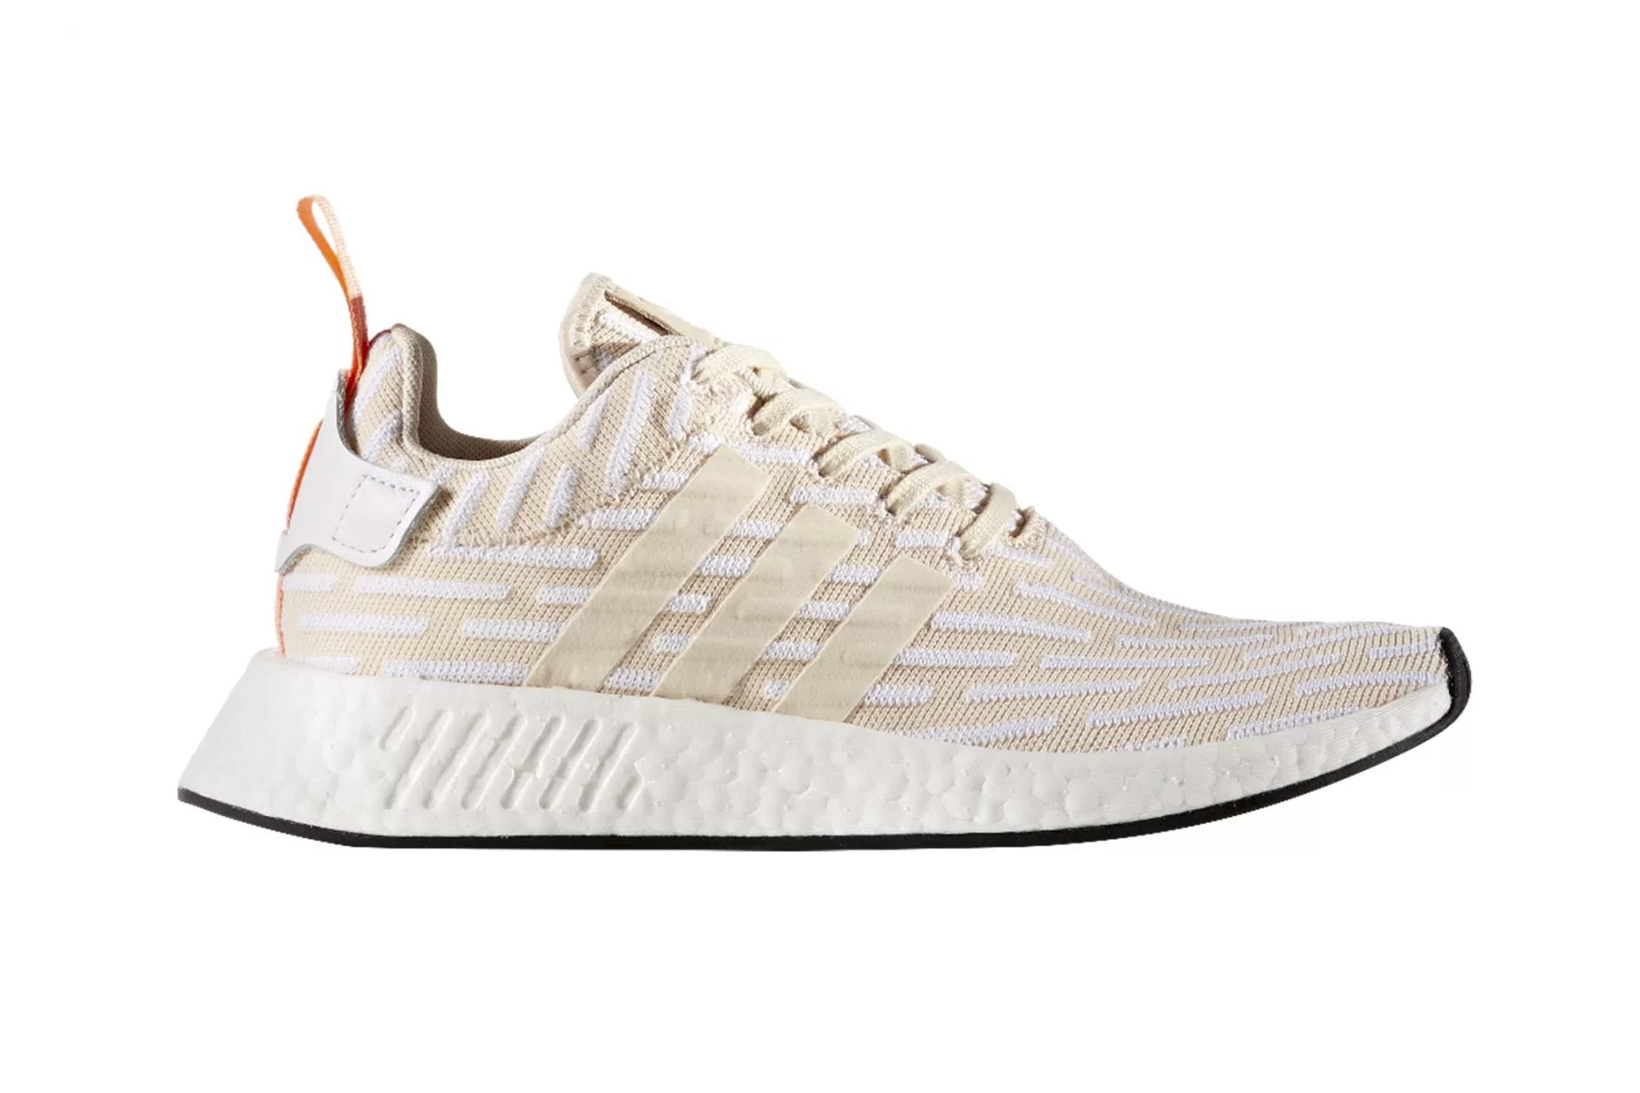 adidas Originals NMD_R2 PK Drops 7 New Colorways - 3771104